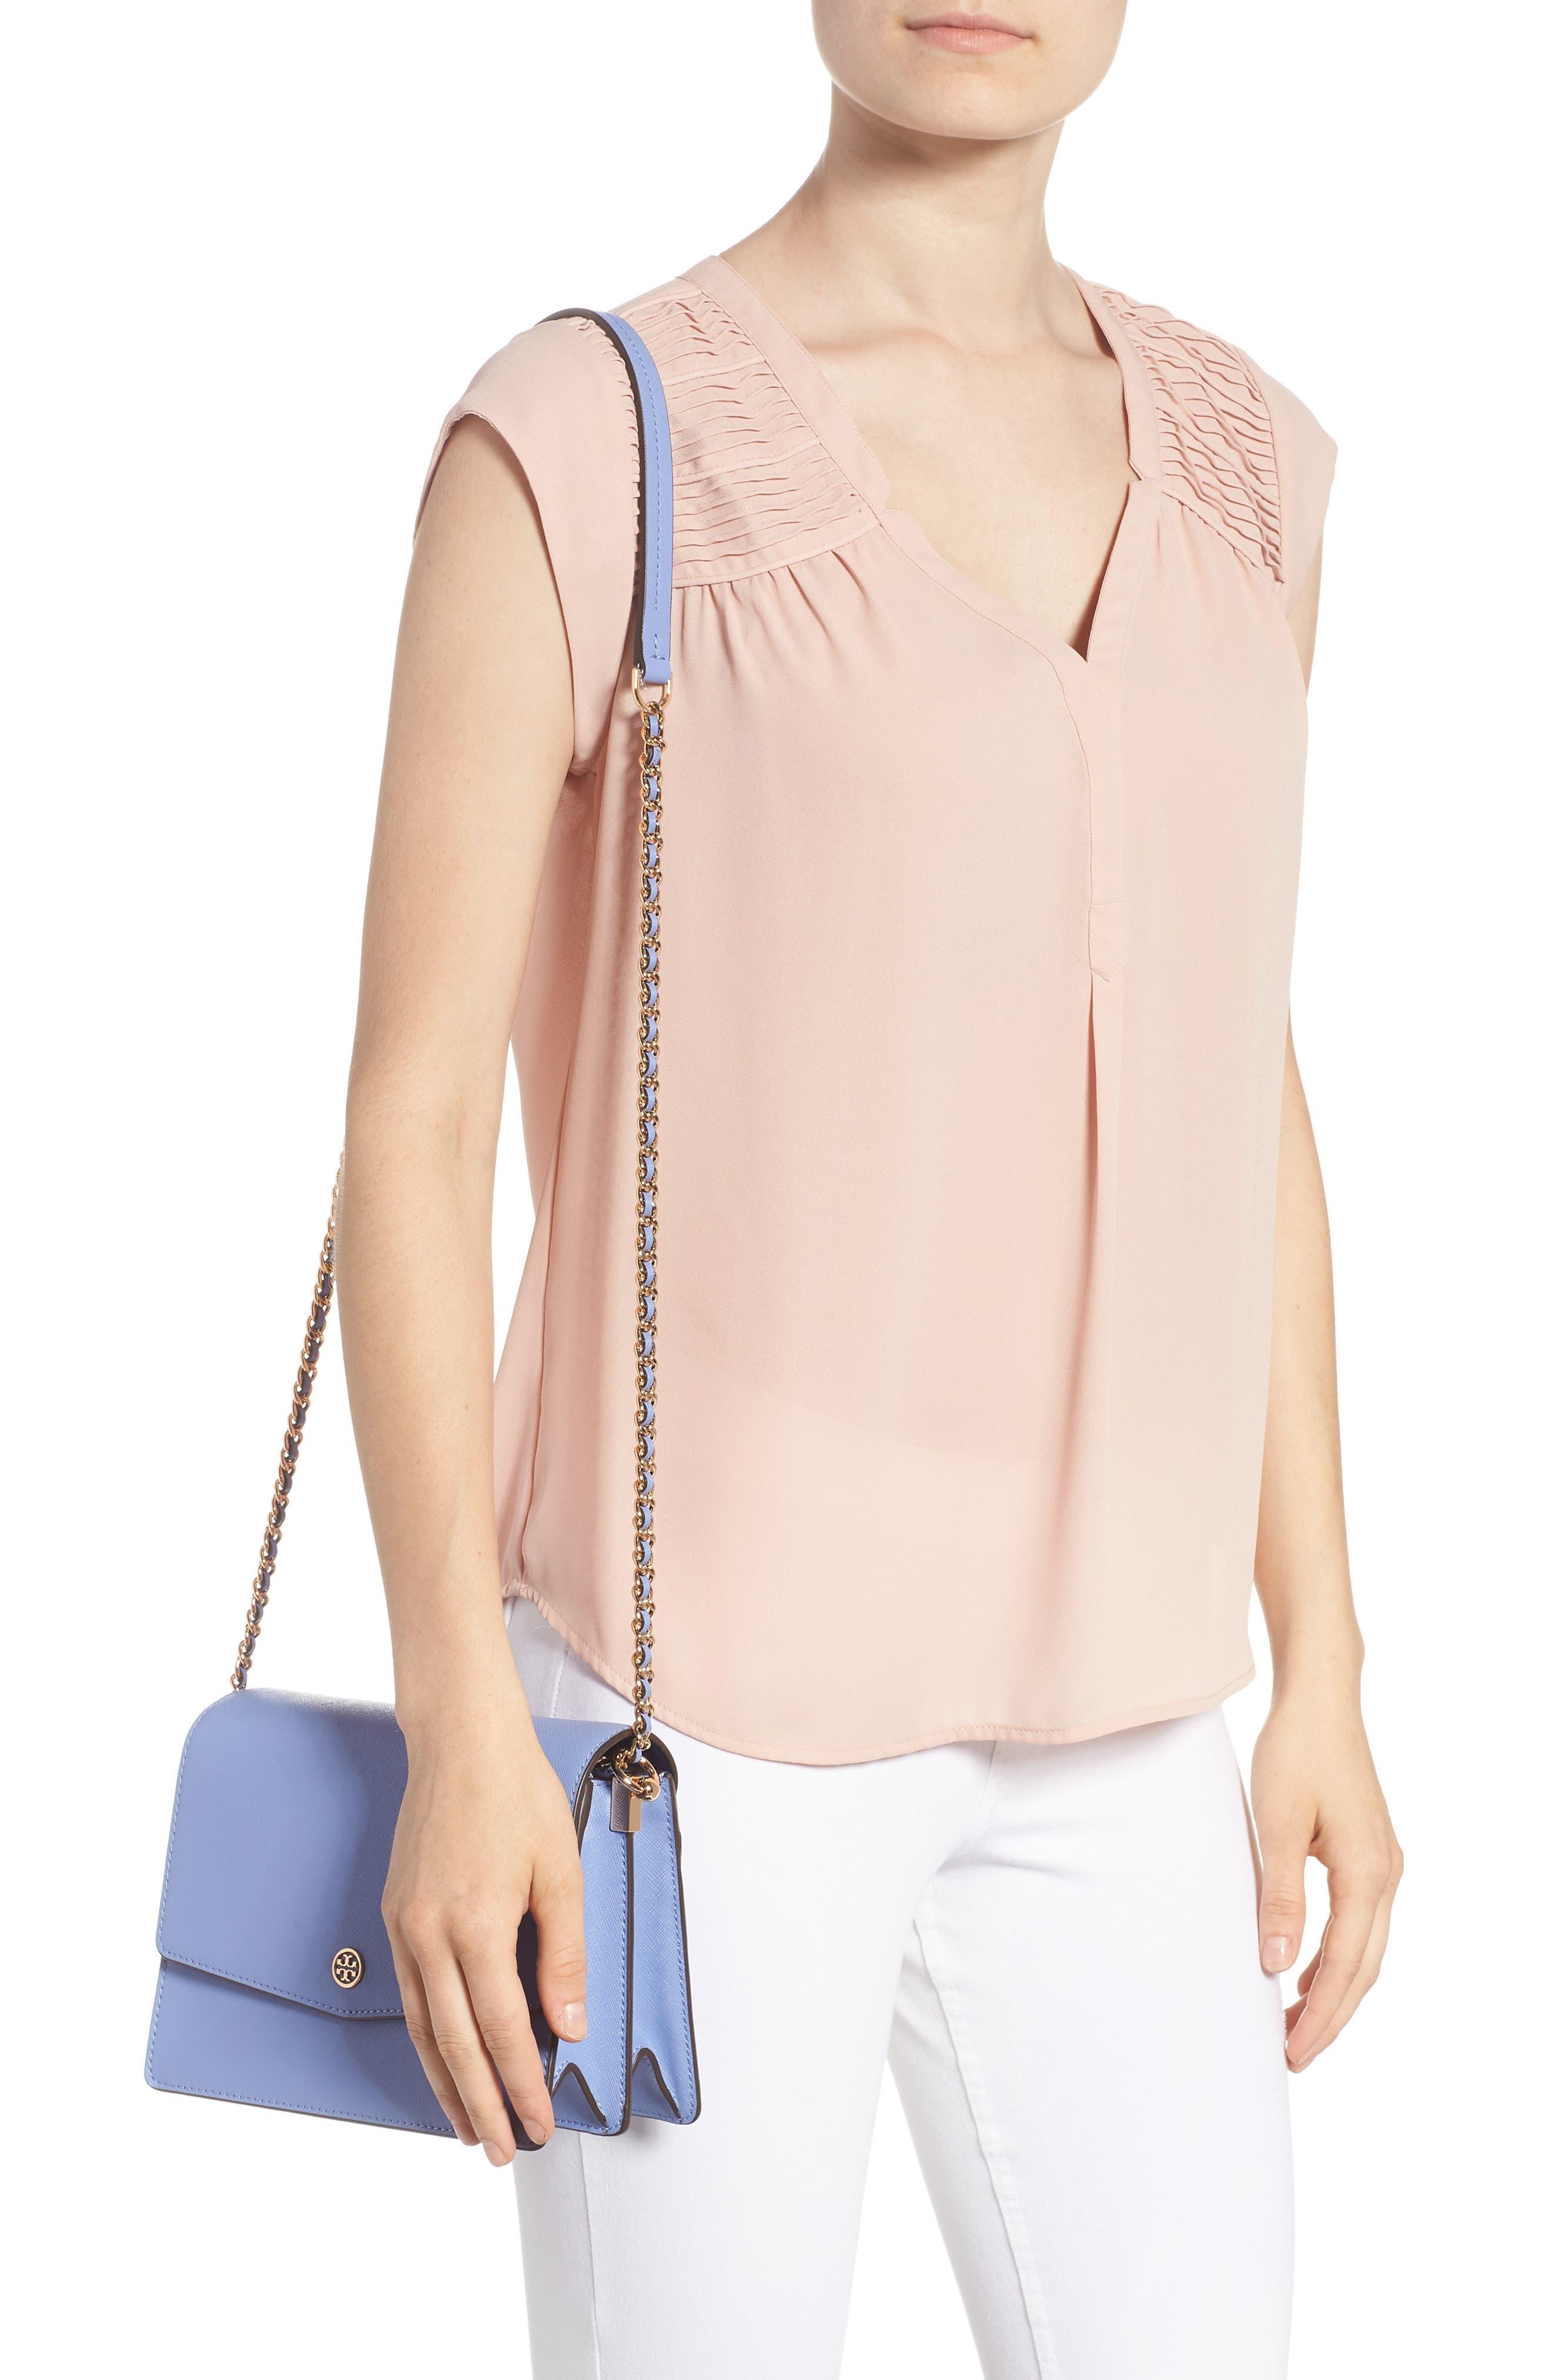 Robinson Convertible Leather Shoulder Bag,                             Alternate thumbnail 2, color,                             Bow Blue